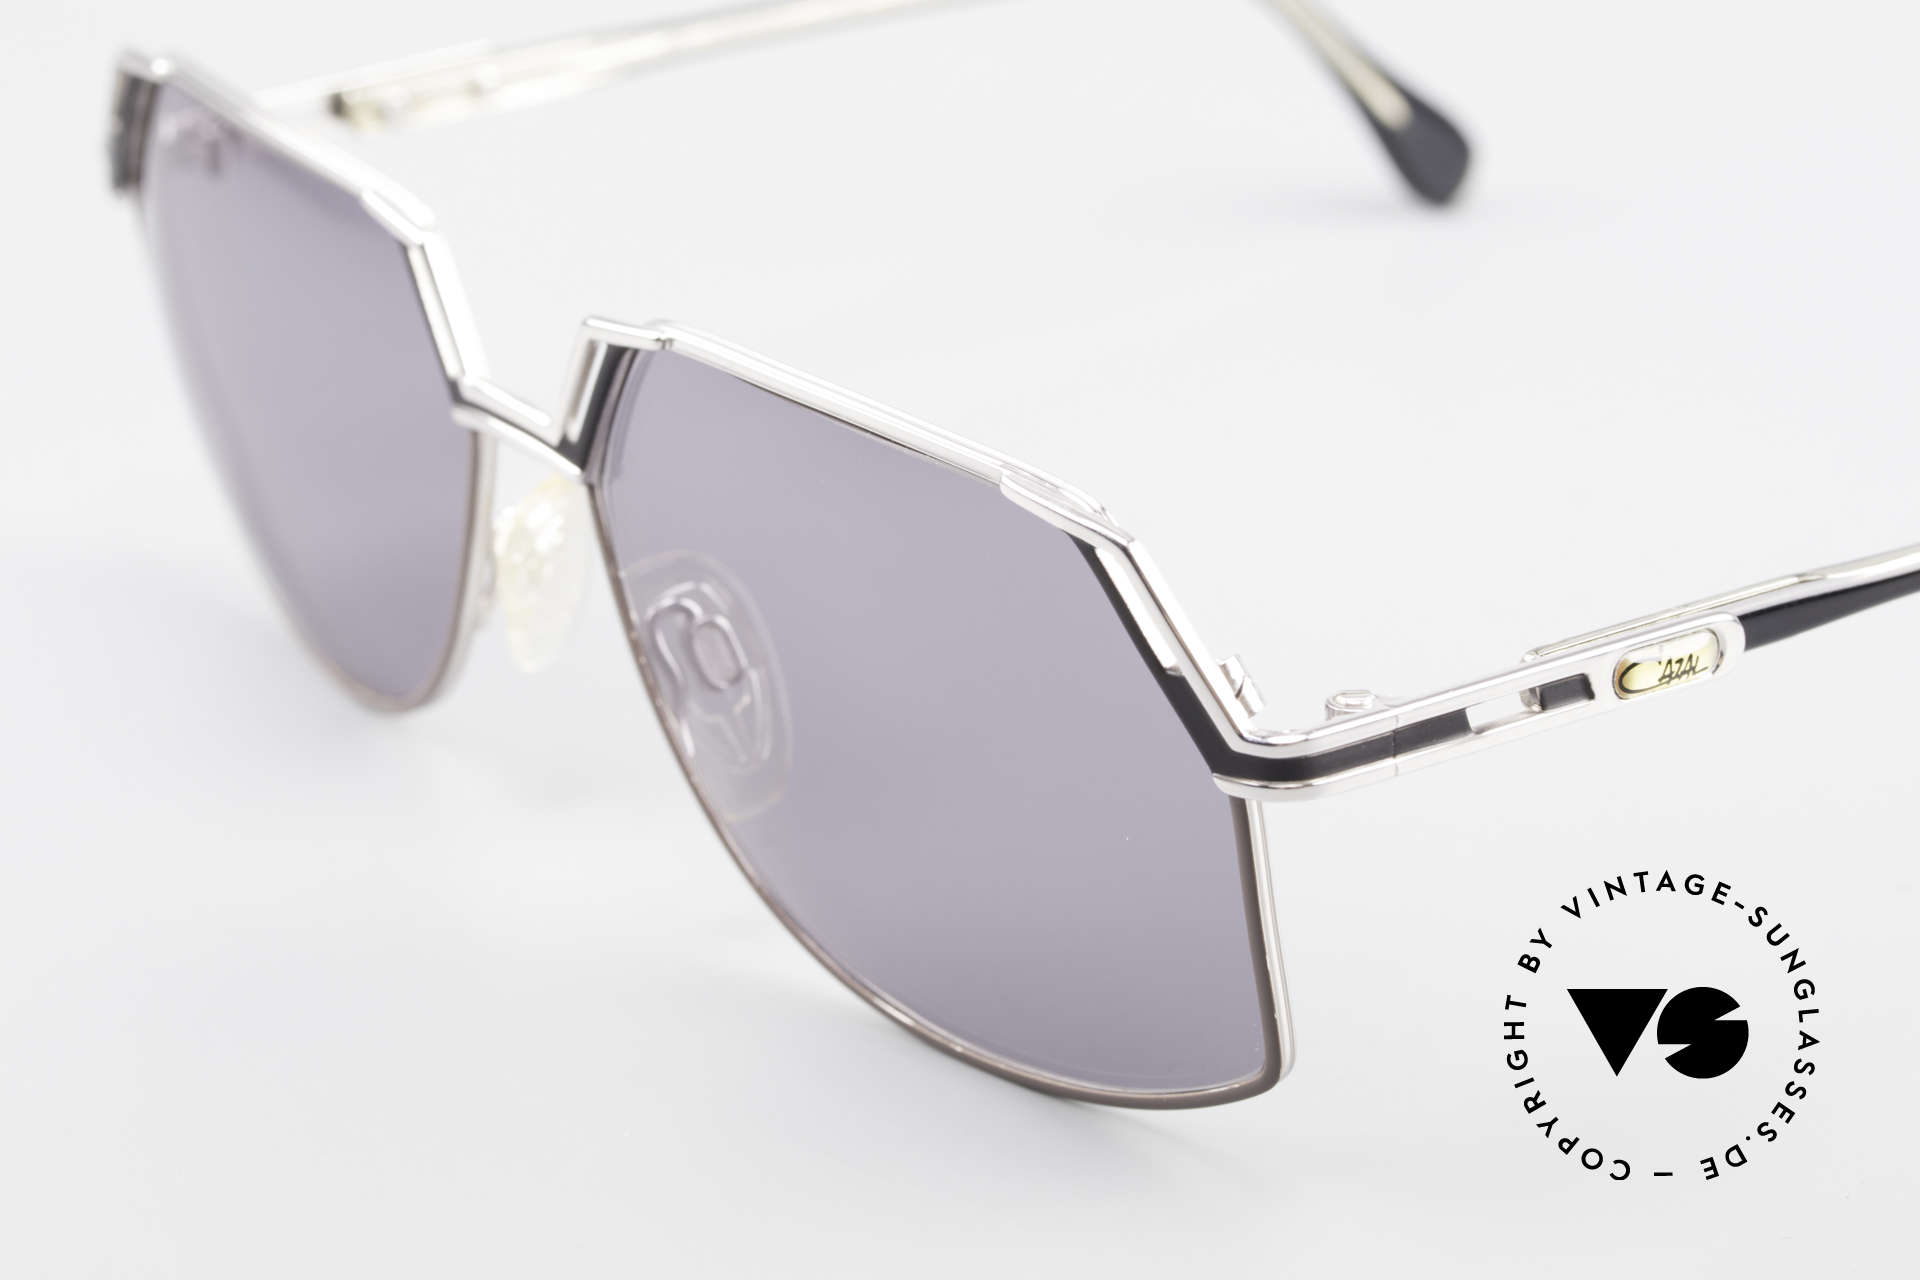 Cazal 738 True Vintage Sunglasses, NO RETRO SHADES, but a rare 30 years old ORIGINAL, Made for Men